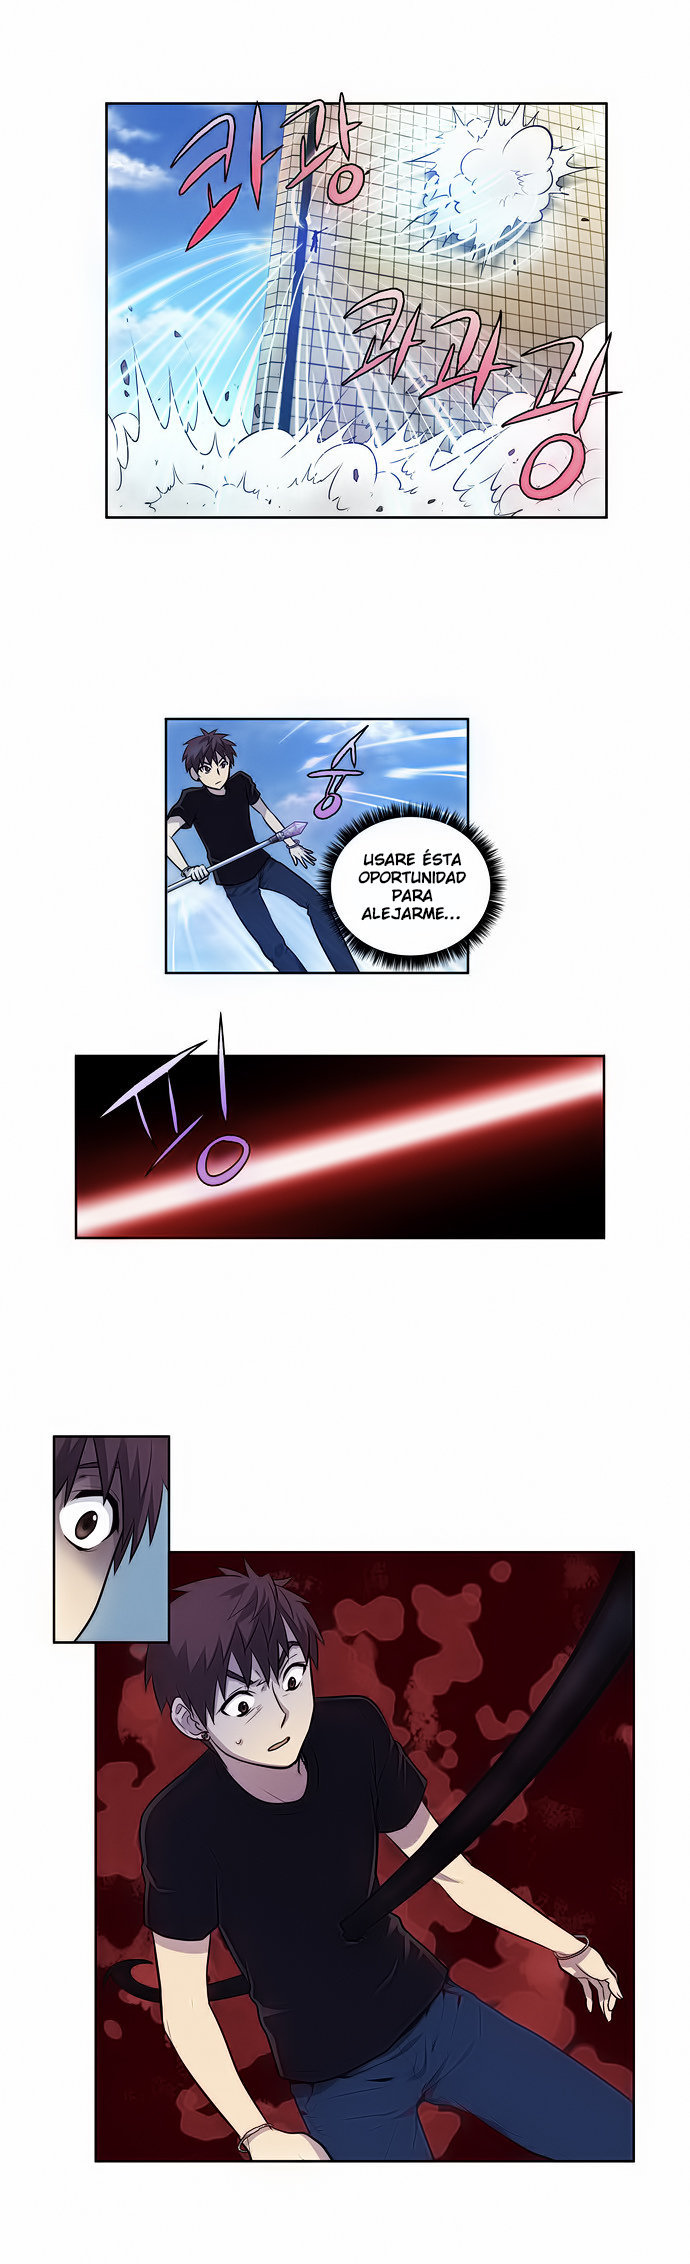 https://c5.ninemanga.com/es_manga/61/1725/439978/1d771deea5fb84cc6e1be213cf616951.jpg Page 10